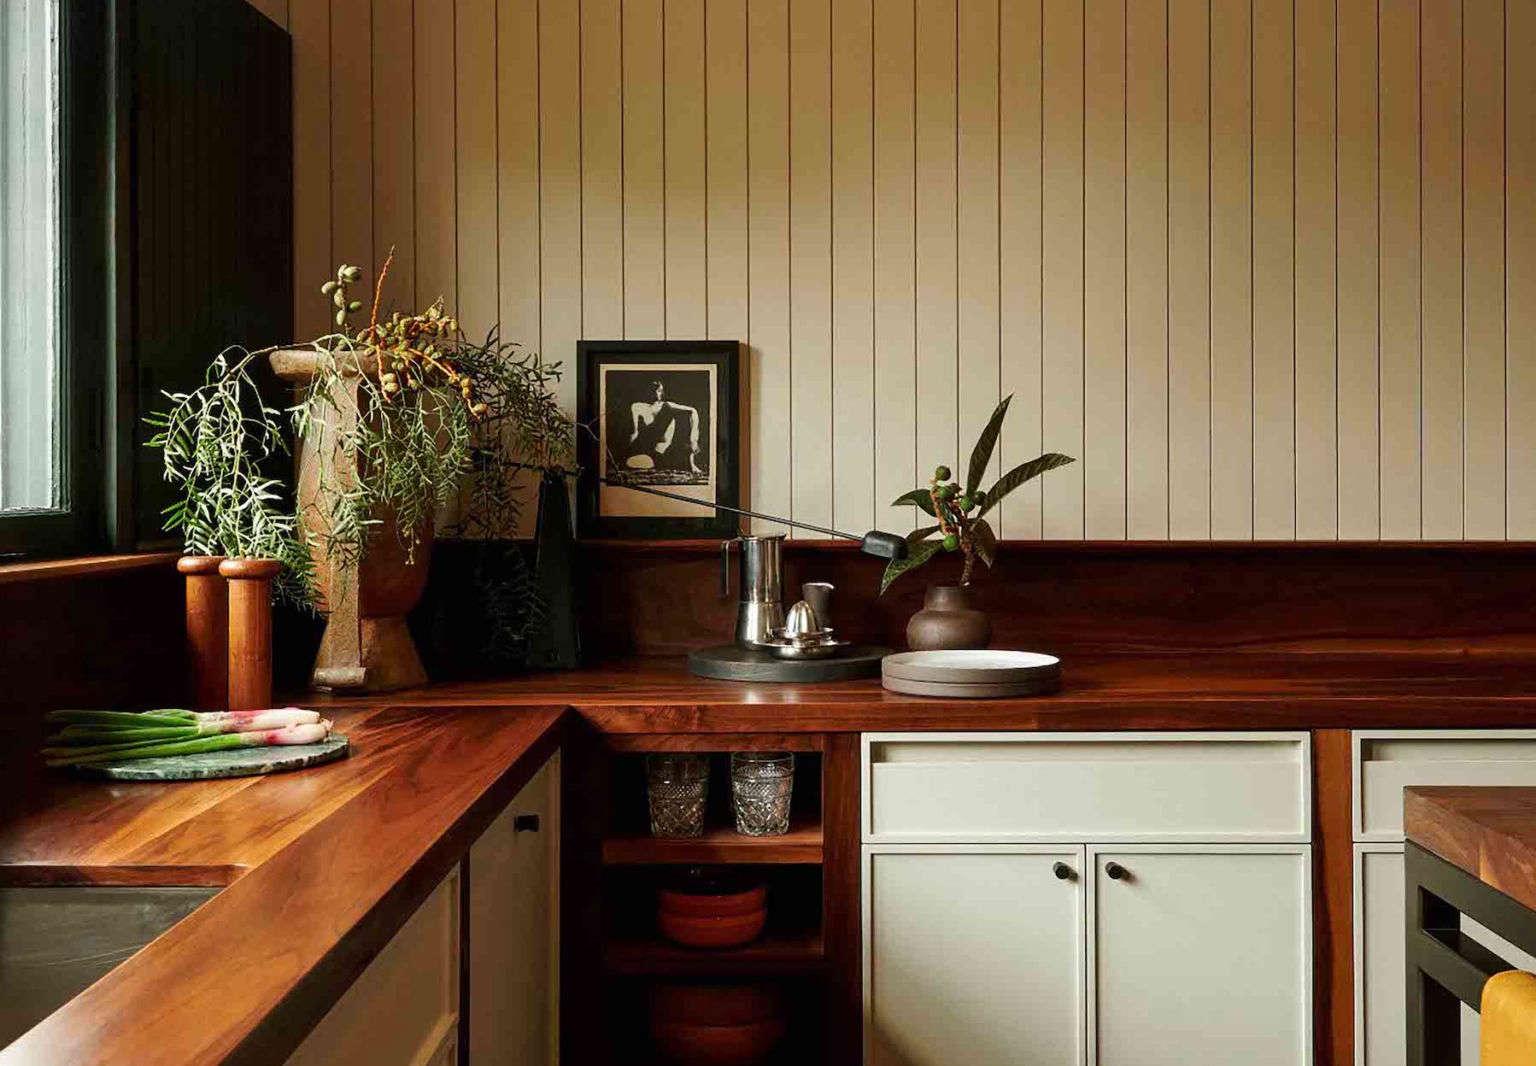 patrick bernatz ward summit house los angeles kitchen